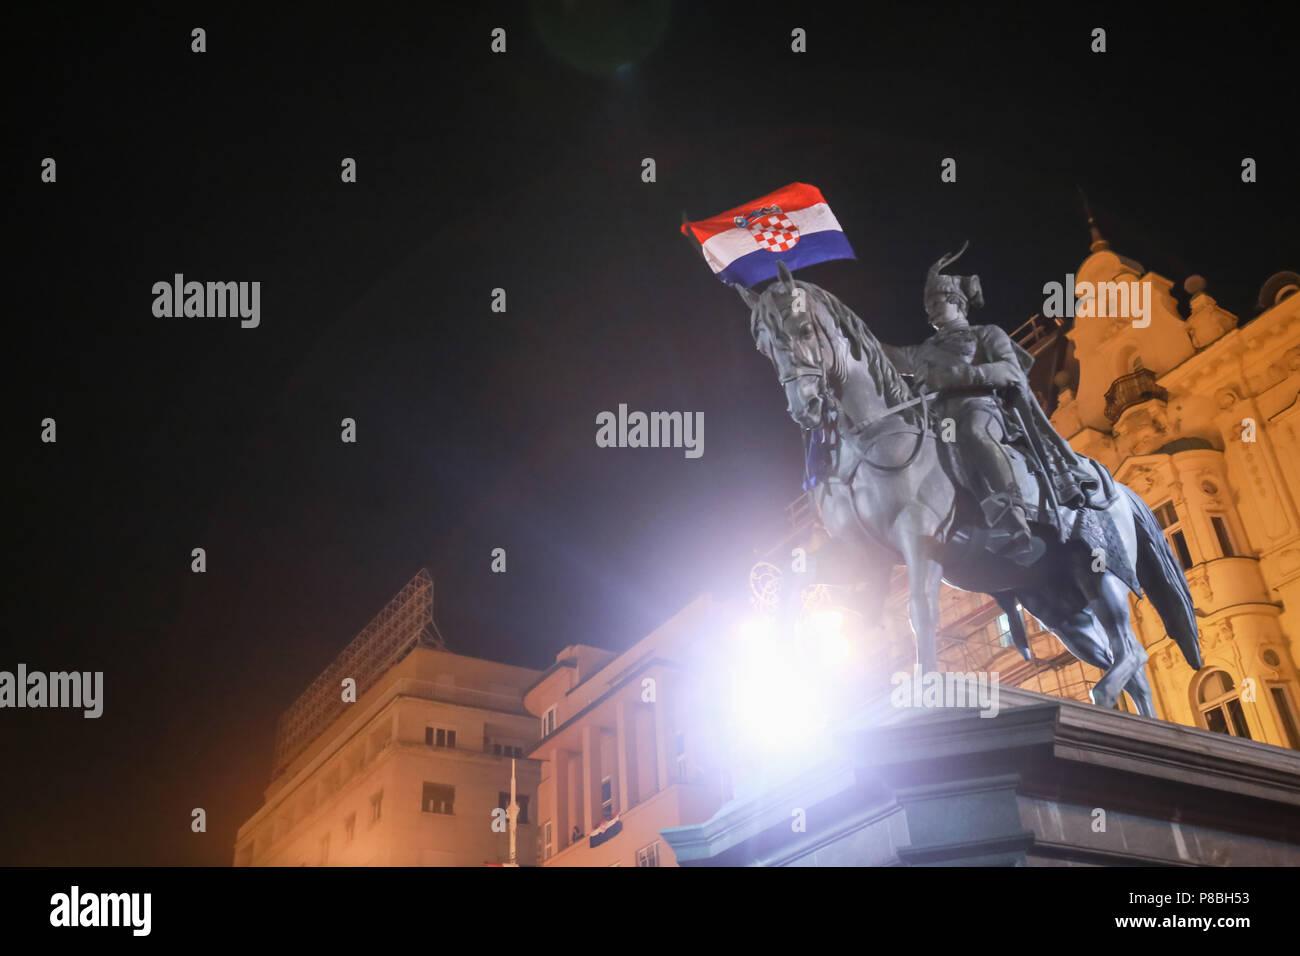 ZAGREB, CROATIA - JULY 7TH, 2018 : Croatian football fans flagged the Croatian flag on the statue of Ban Josip Jelacic after win of Croatian national  Stock Photo